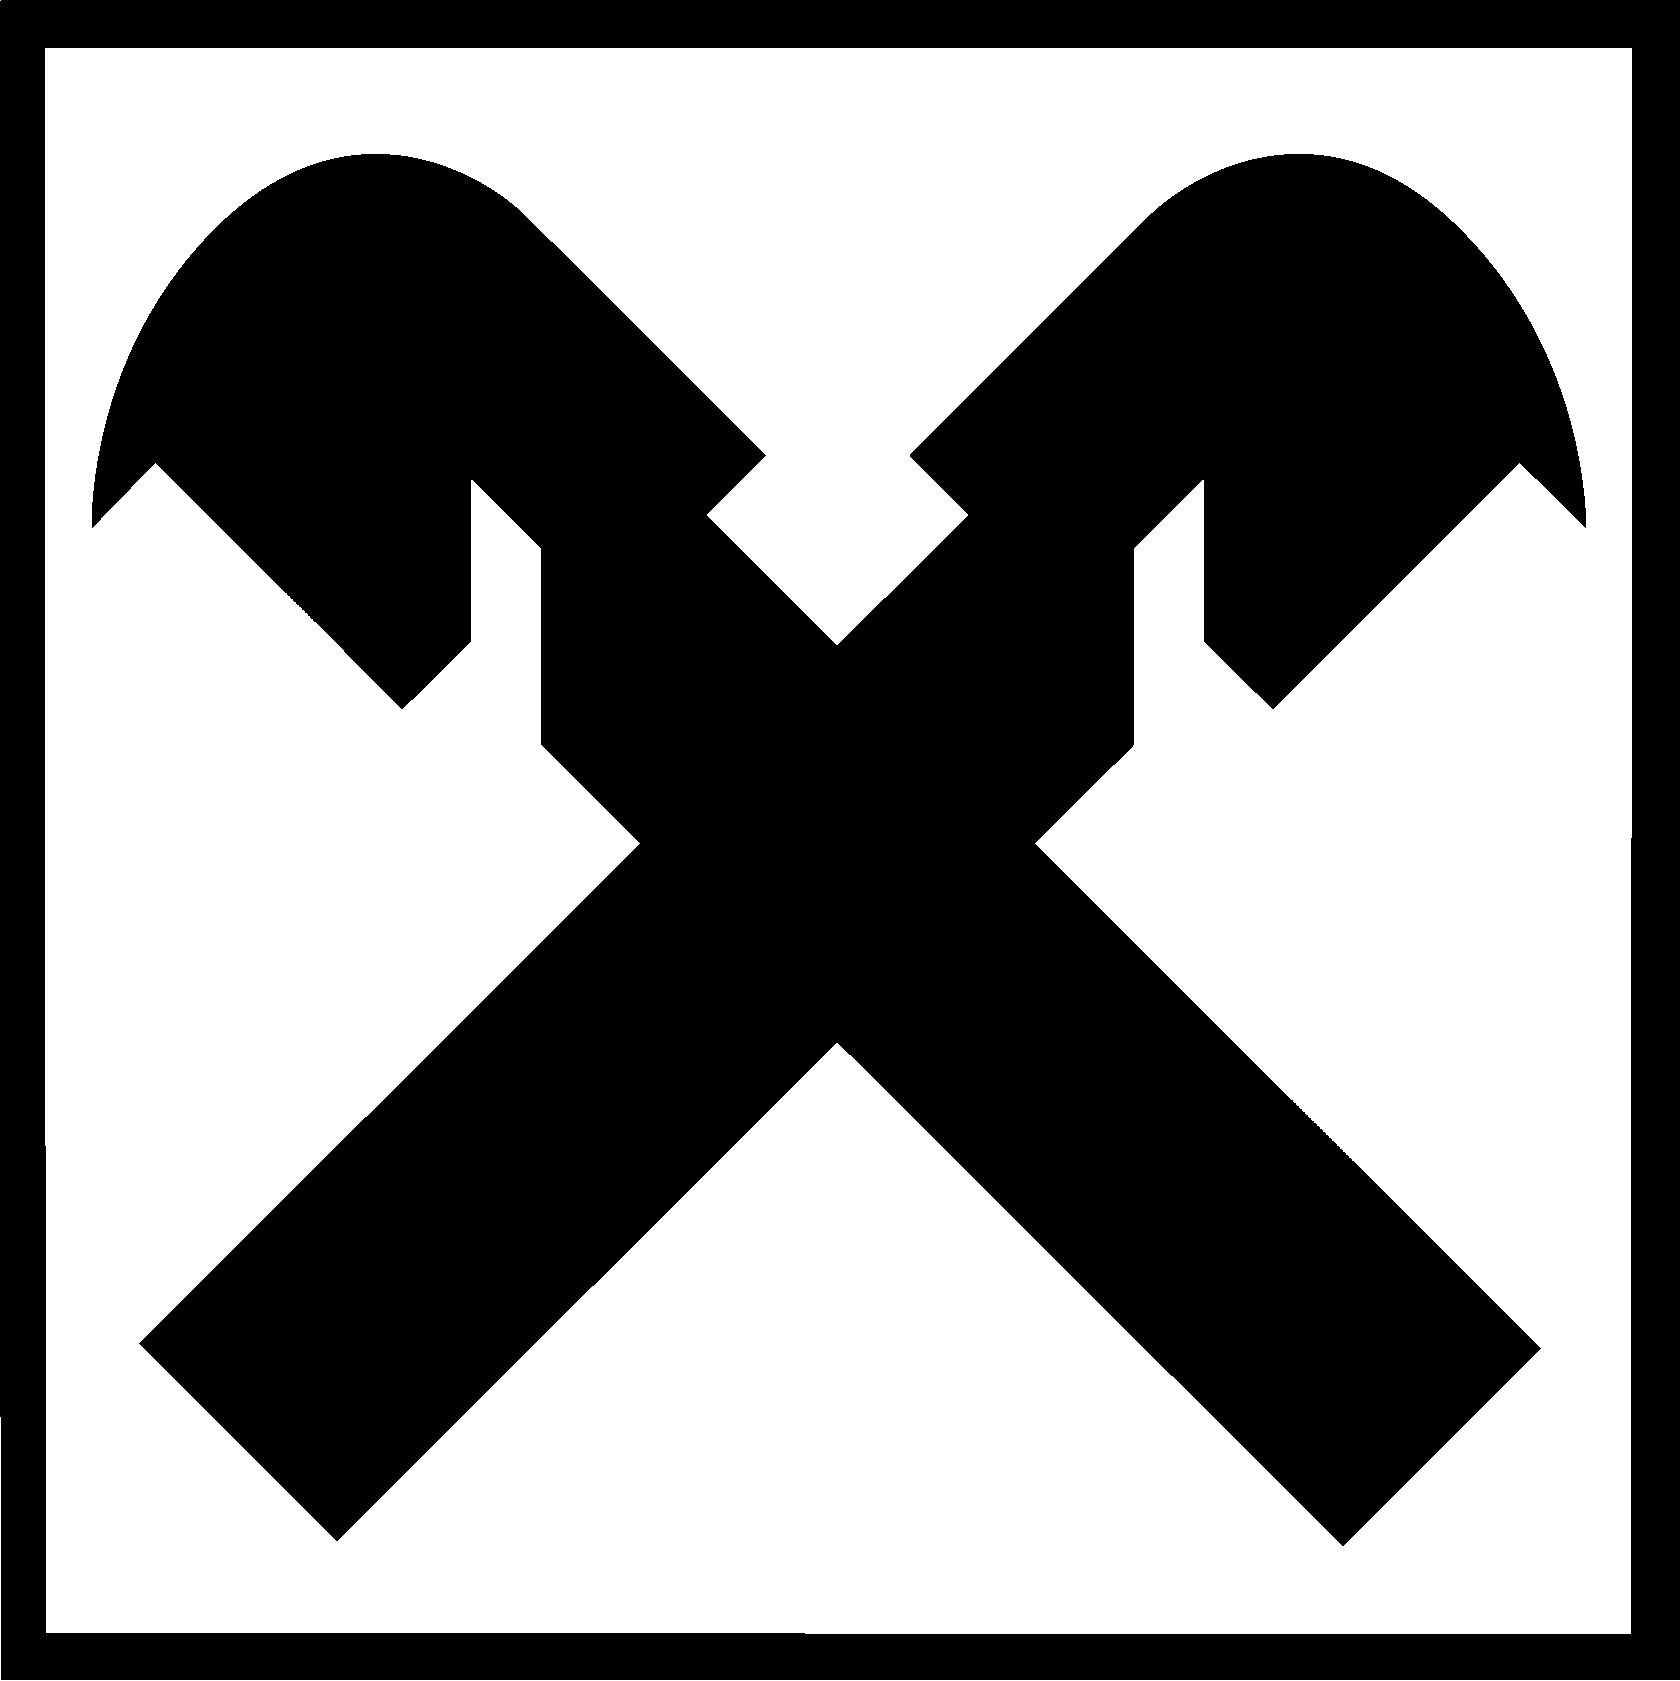 Эмблема райффайзенбанка картинки